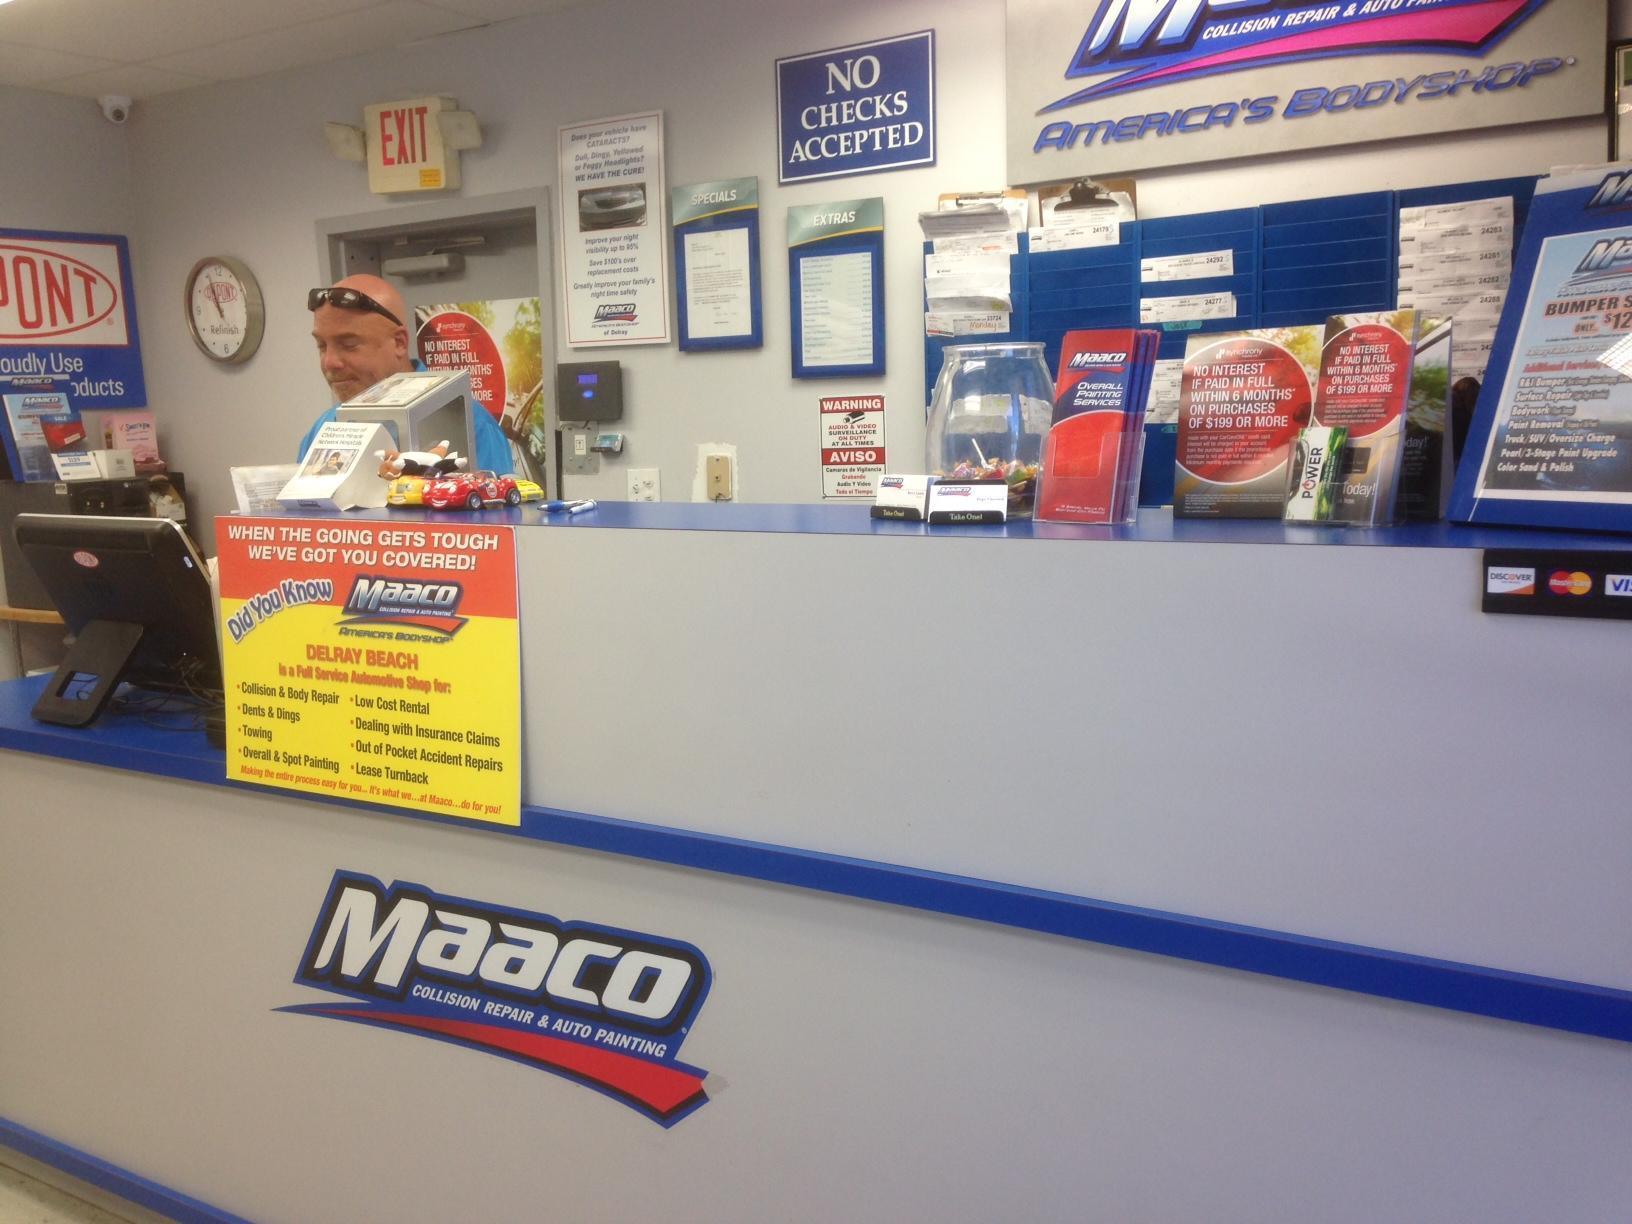 Maaco Collision Repair & Auto Painting image 5